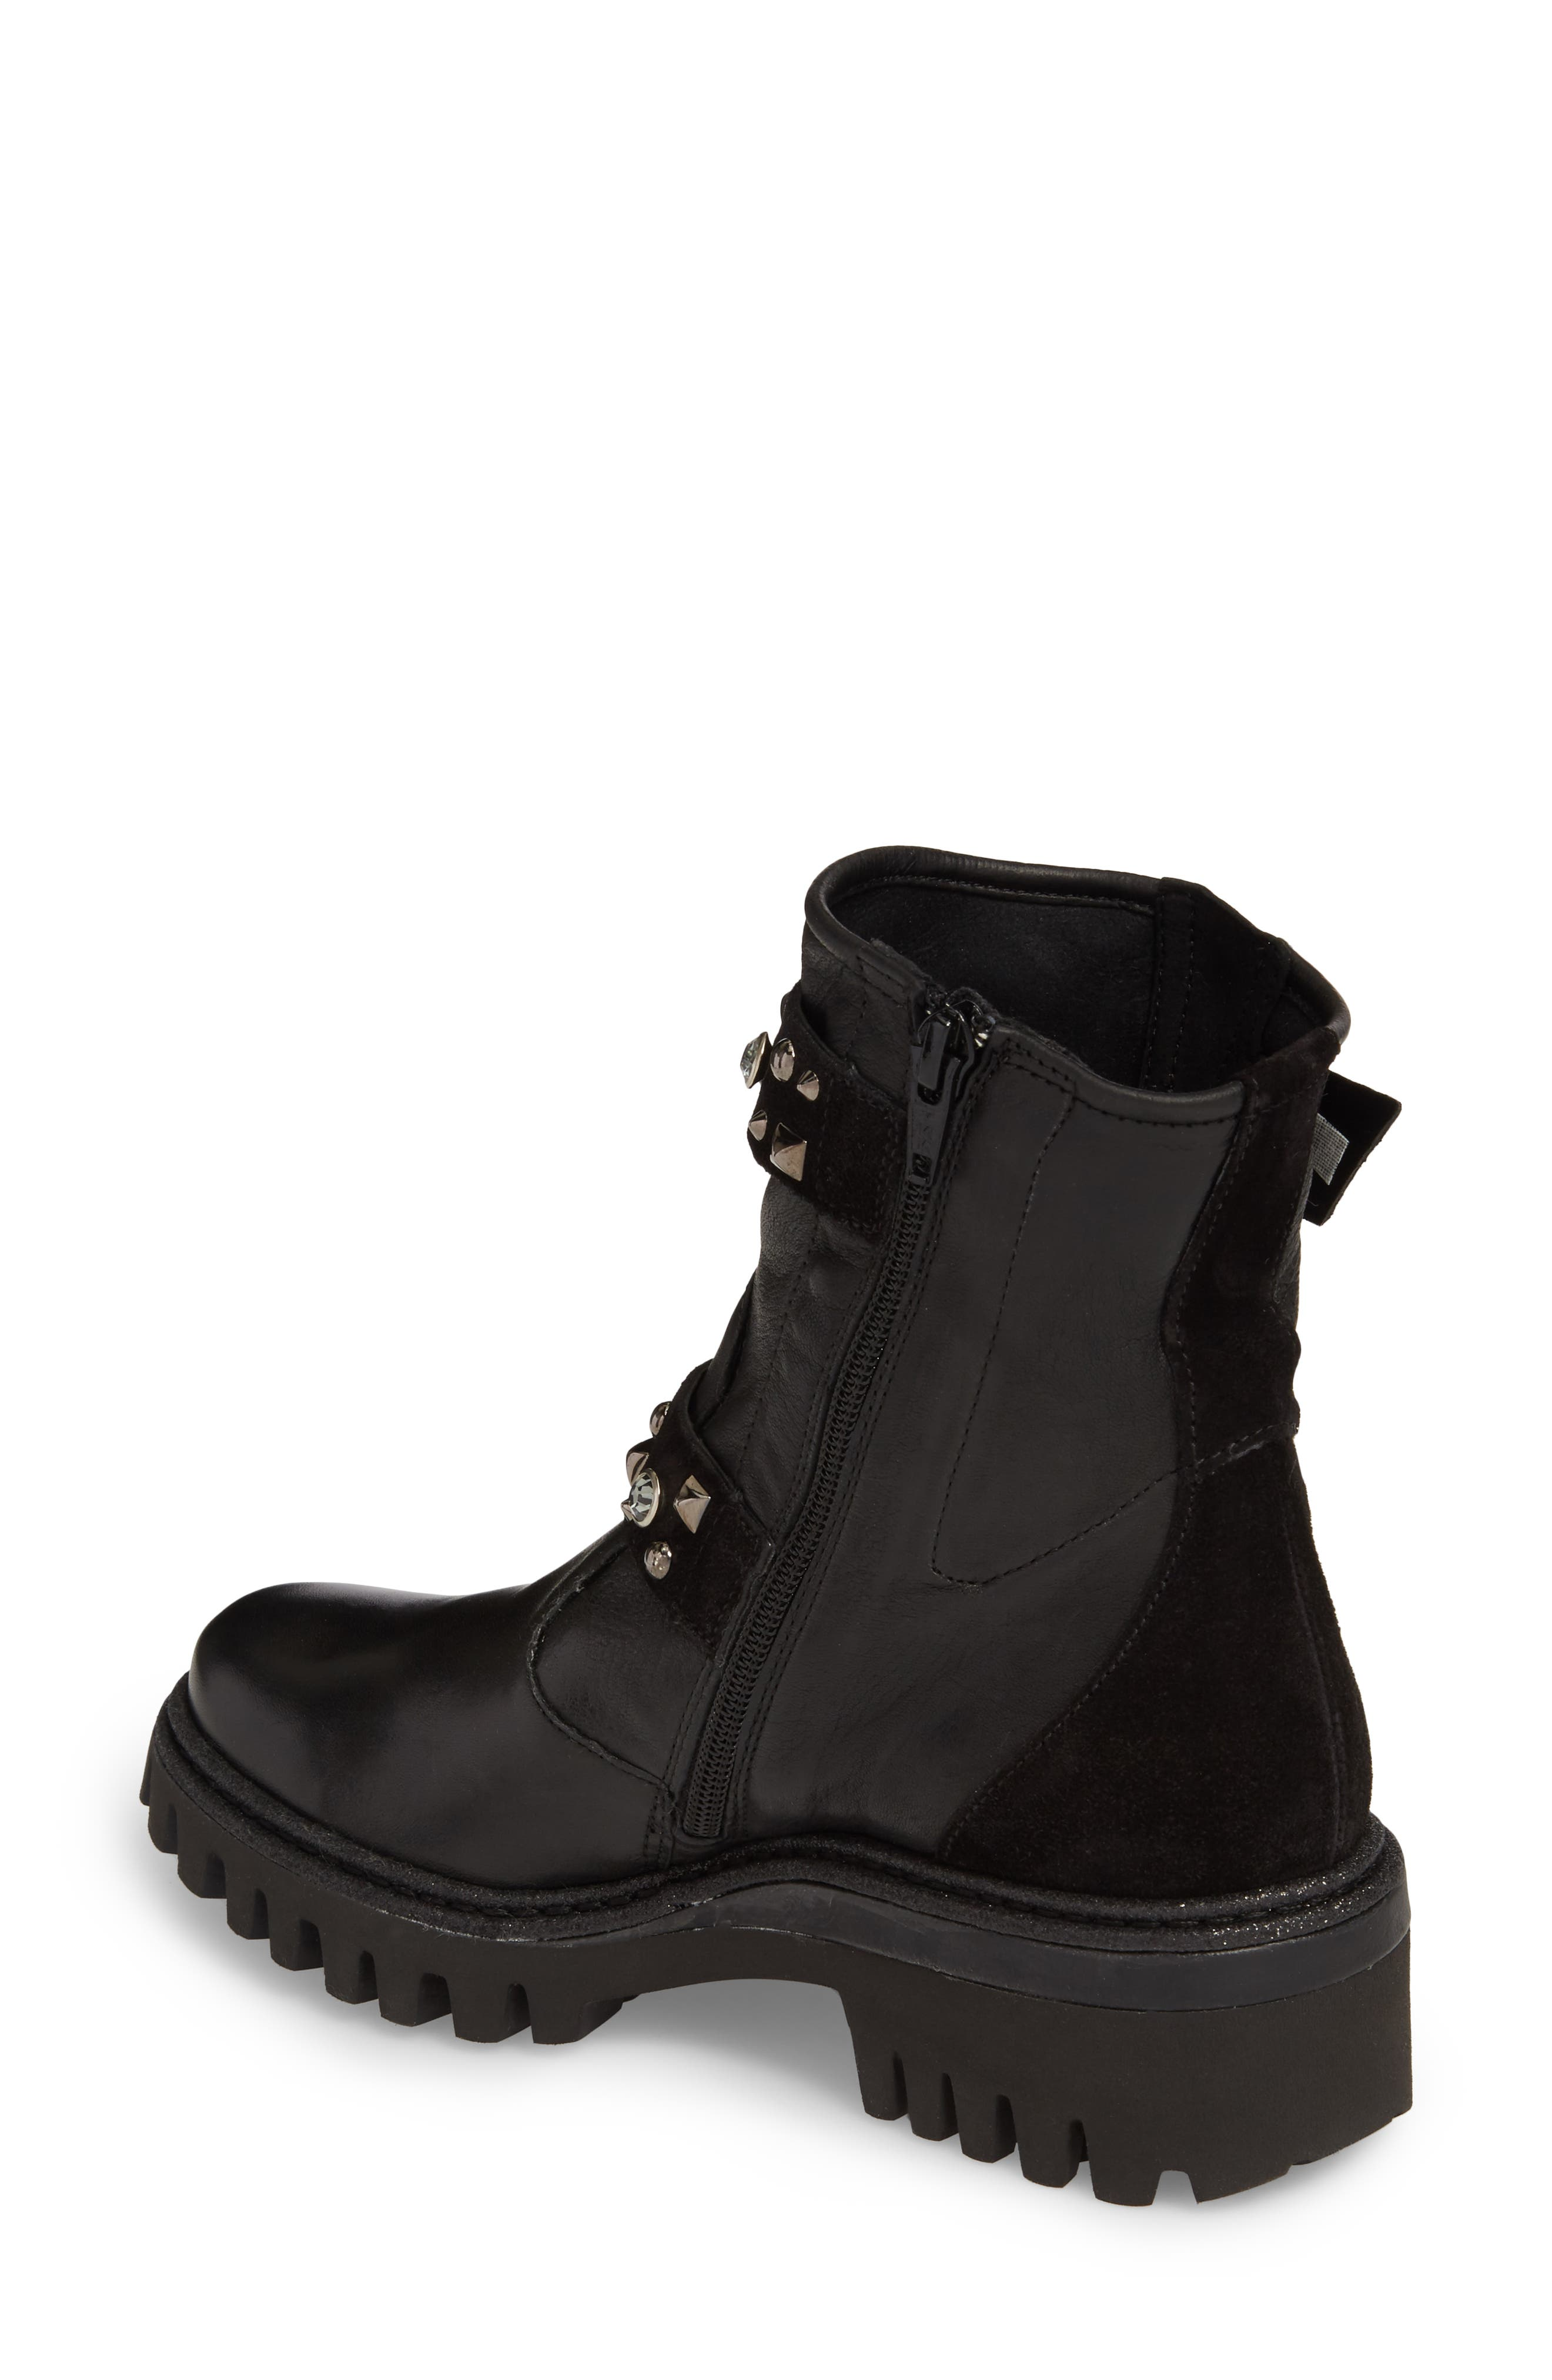 Rivet Moto Boot,                             Alternate thumbnail 2, color,                             Black Leather